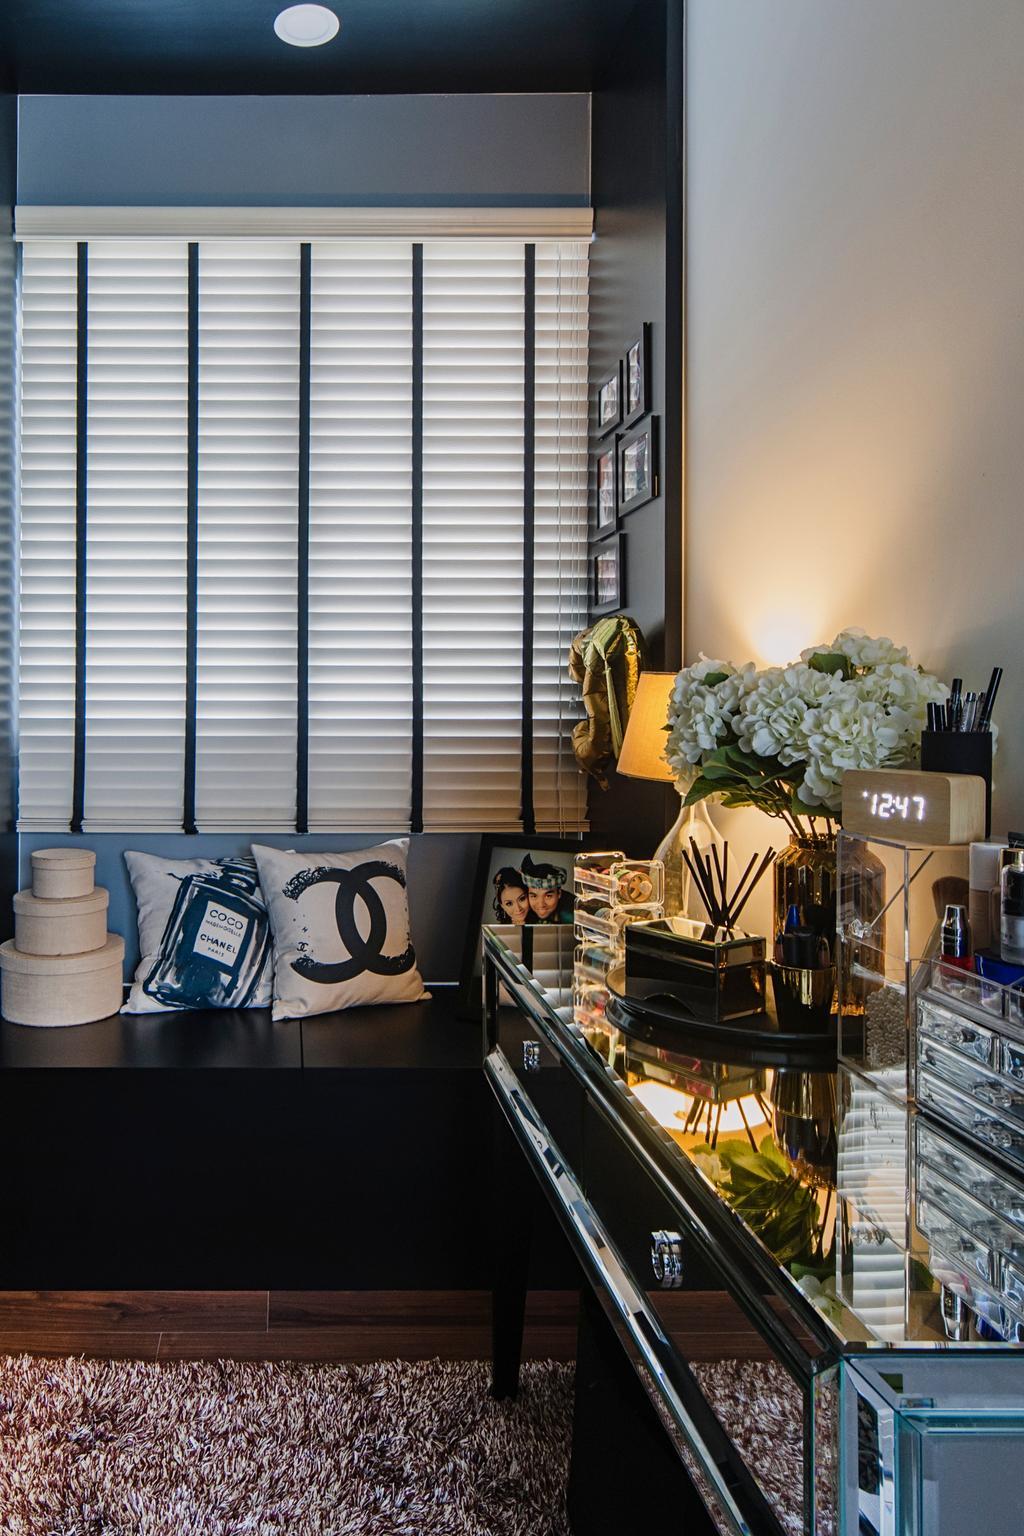 Contemporary, Condo, Bellewoods, Interior Designer, Cozy Ideas Interior Design, Flora, Jar, Plant, Potted Plant, Pottery, Vase, Appliance, Electrical Device, Oven